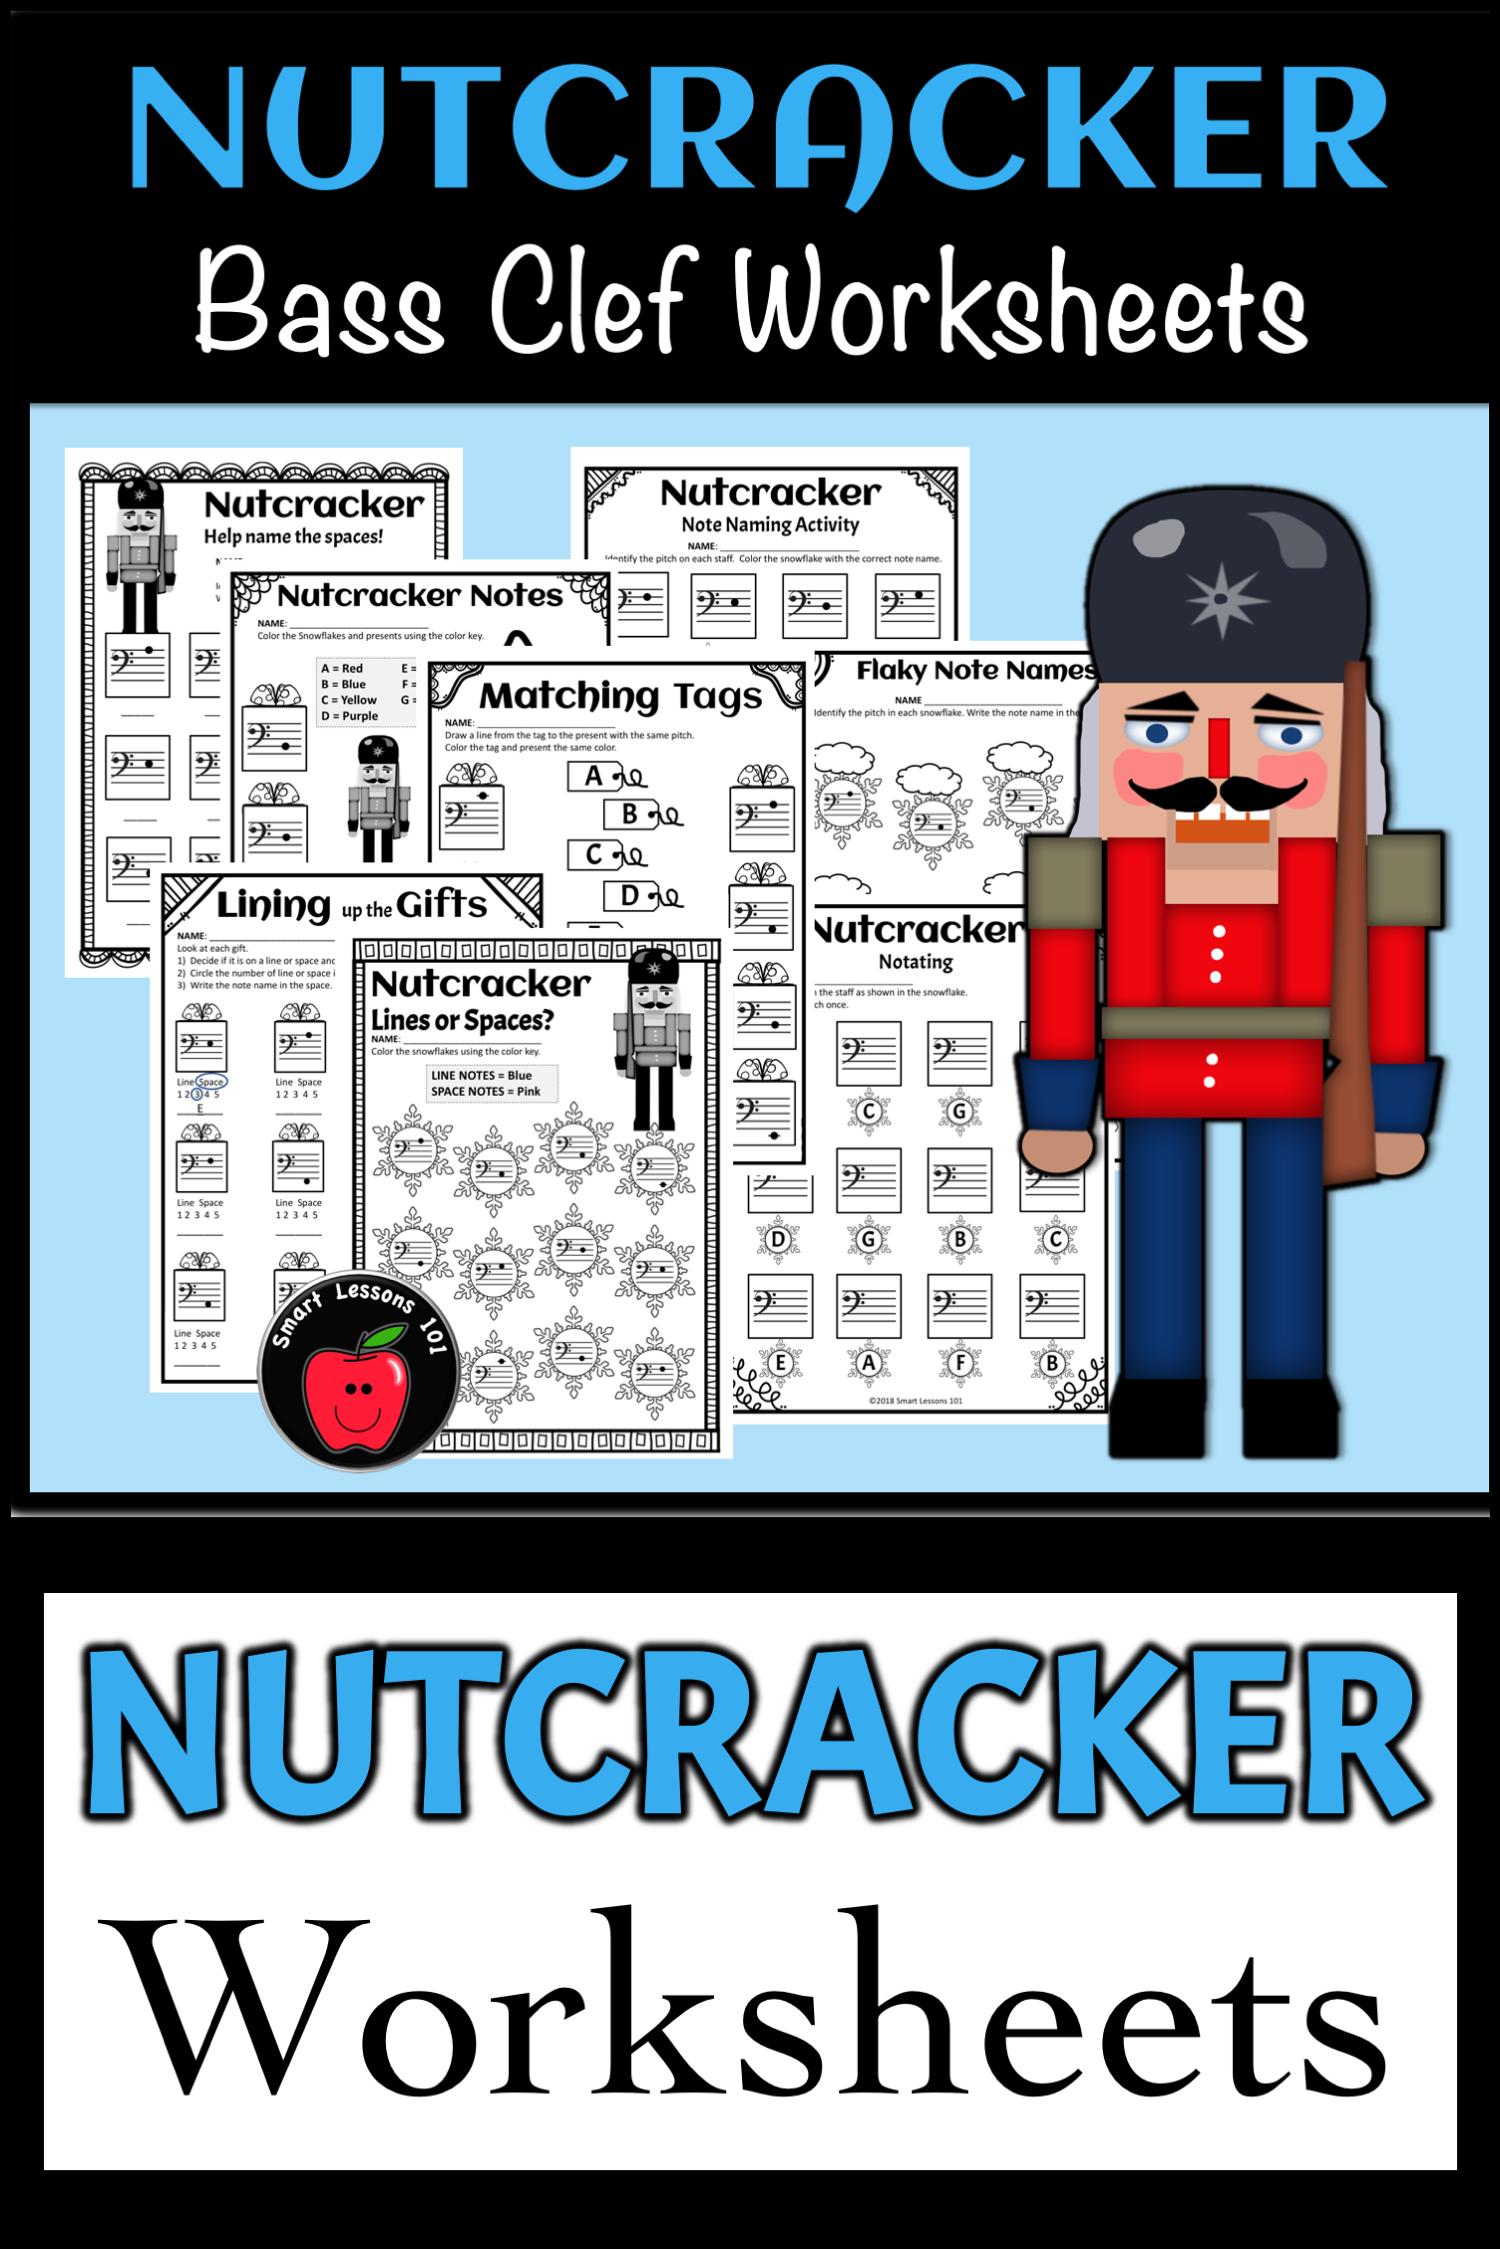 Nutcracker Worksheets Nutcracker Note Activities Treble